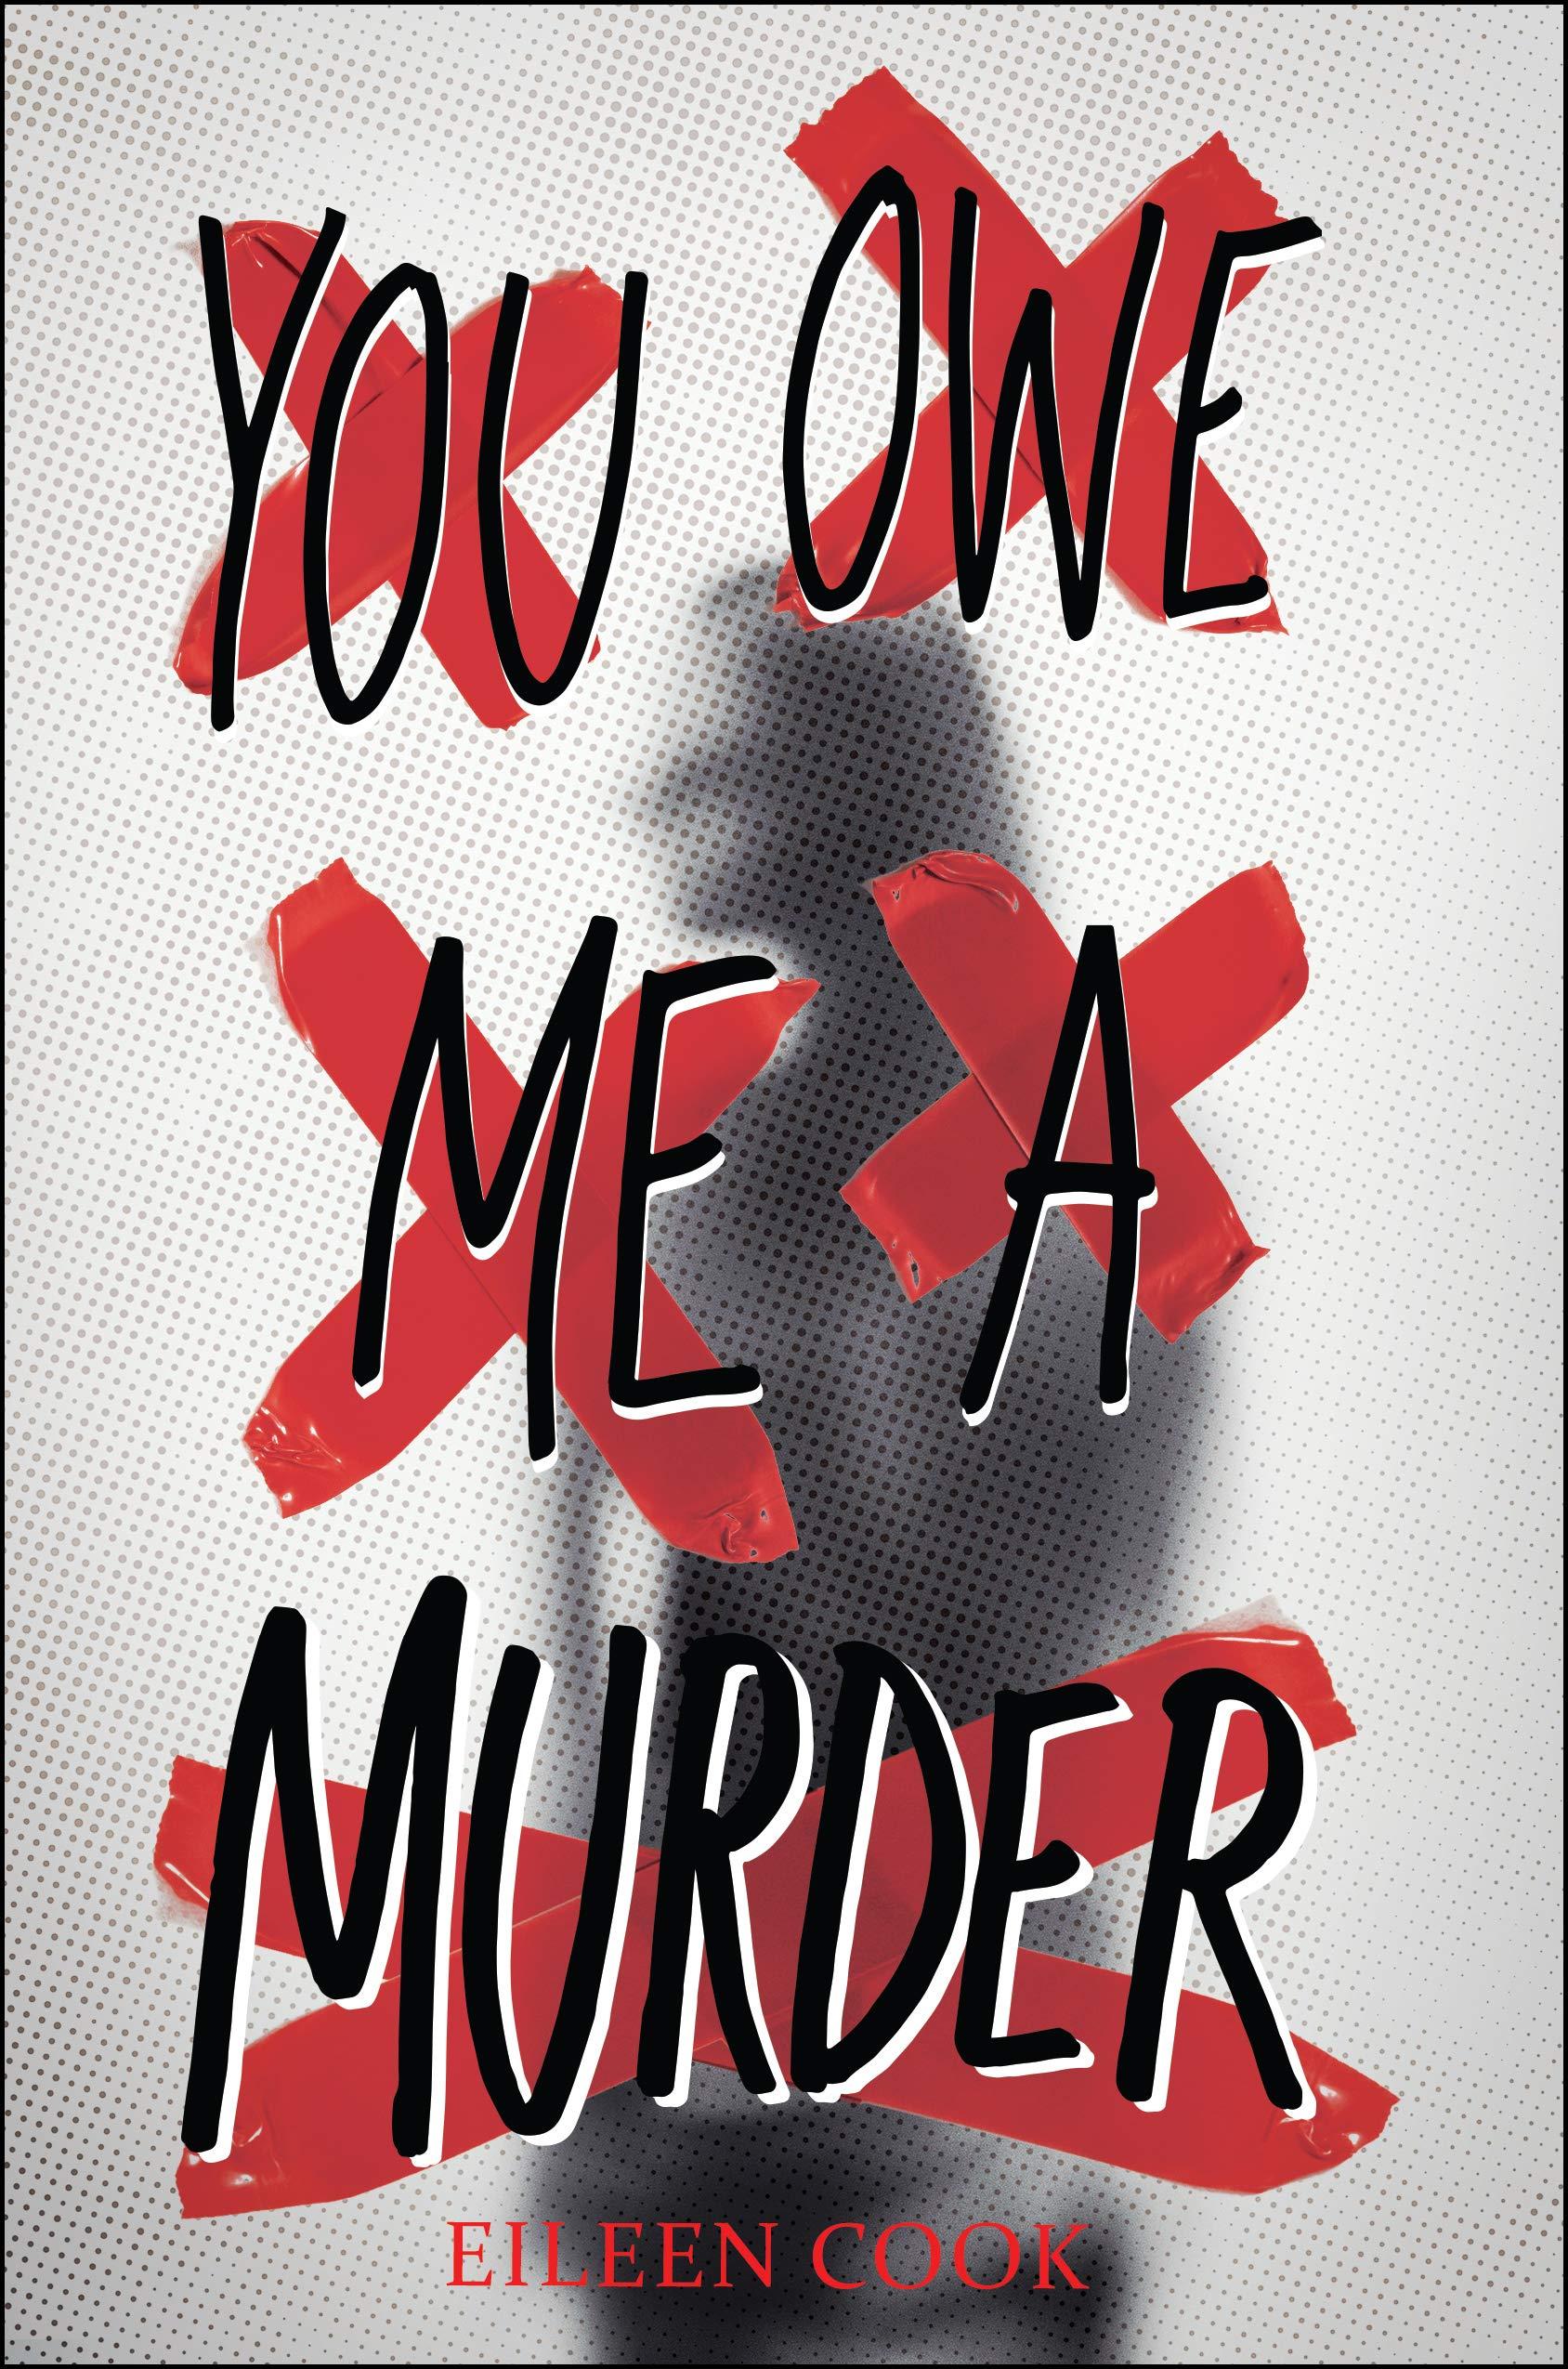 You Owe Me a Murder : Cook, Eileen: Amazon.ca: Books